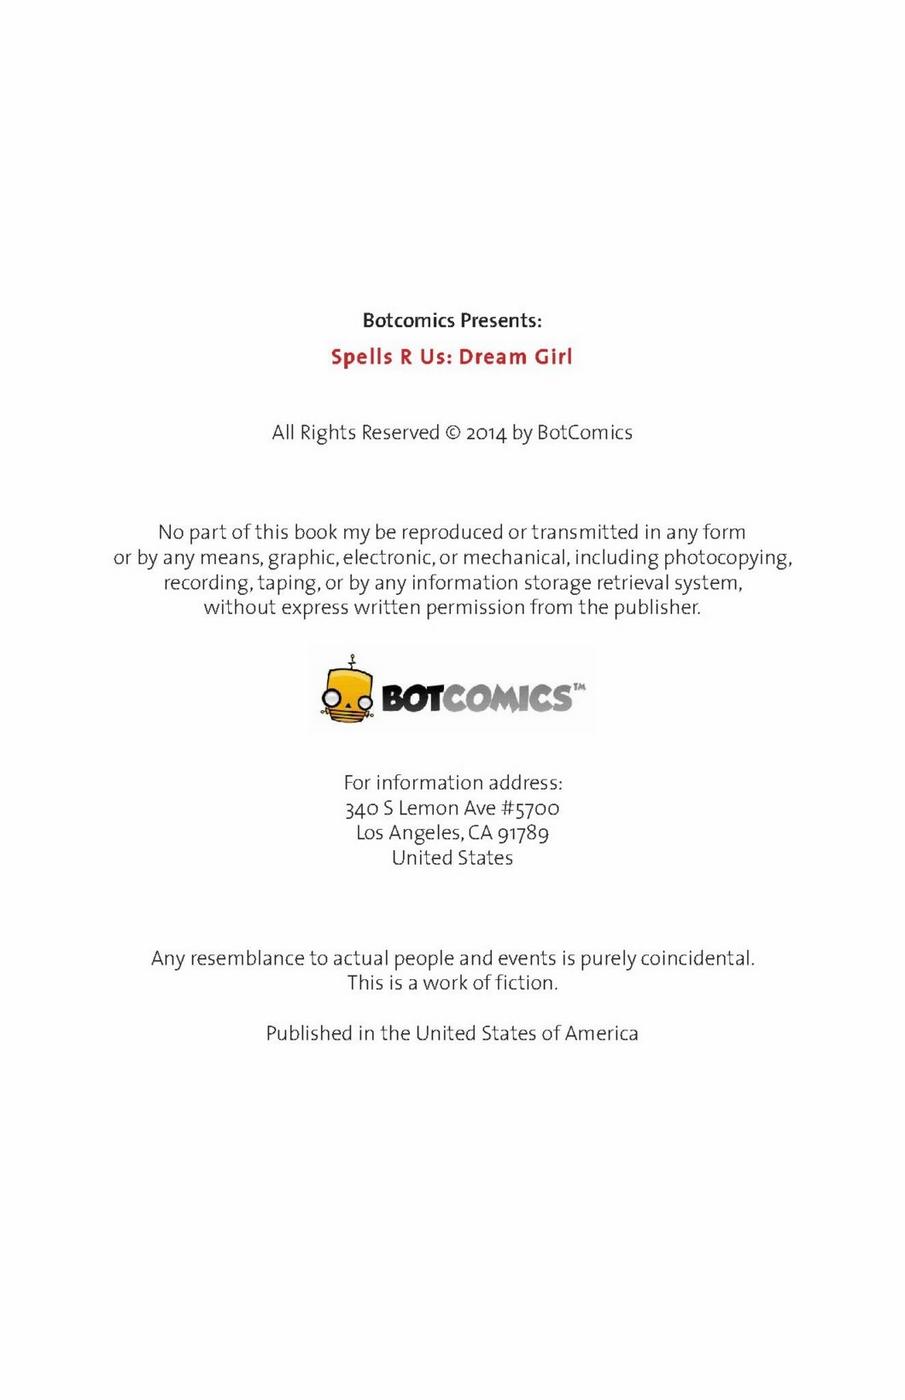 Spells R Us - Dream Girl 2- Bot Comics